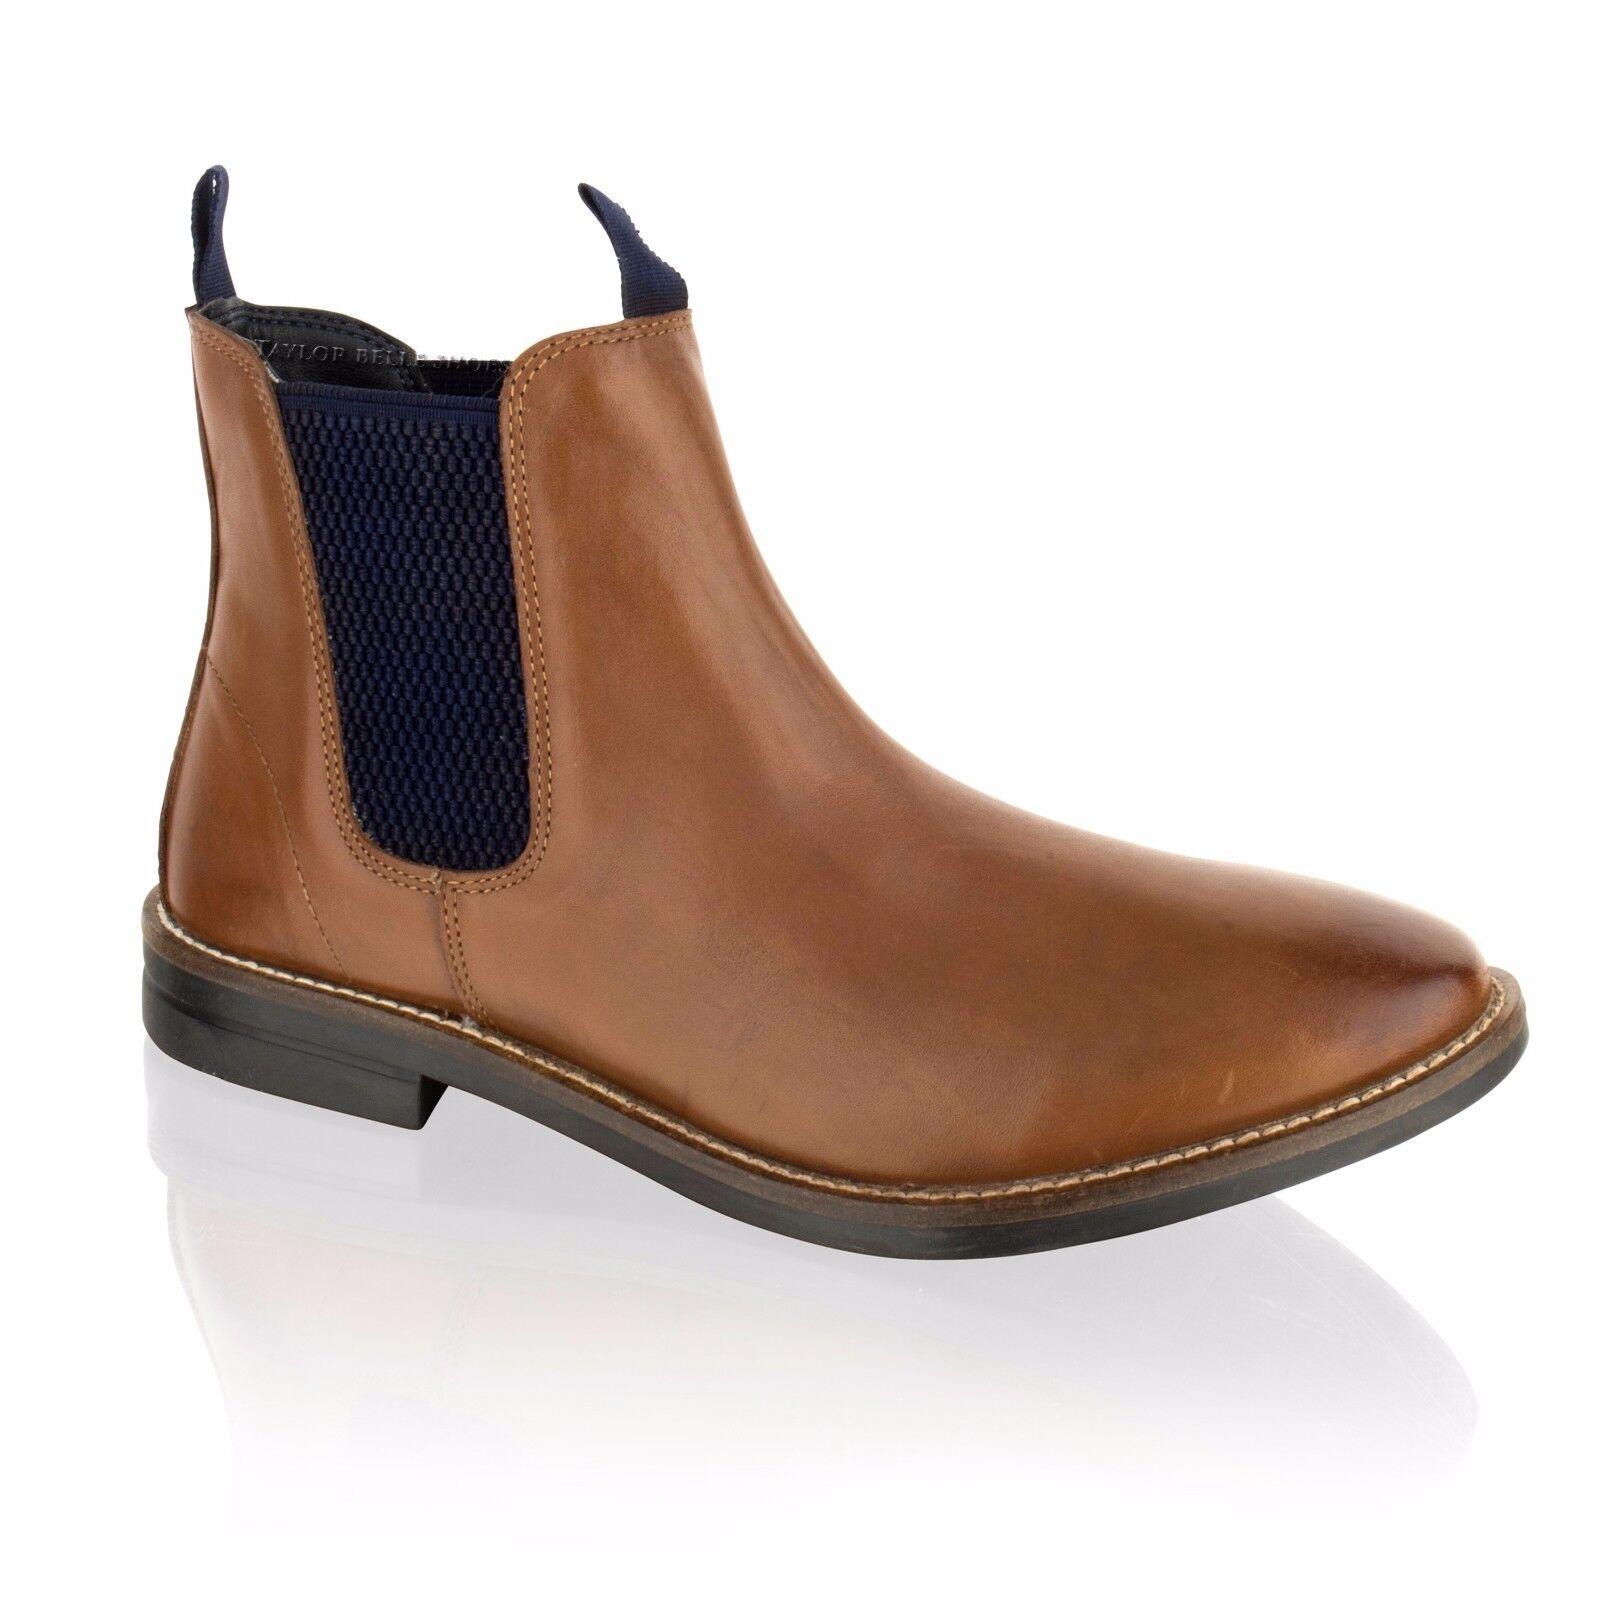 NEU Herren Wildleder Chelsea Dealer Smart 7-12 Kleid Stiefeletten Schuhe Größe 7-12 Smart 253f8d